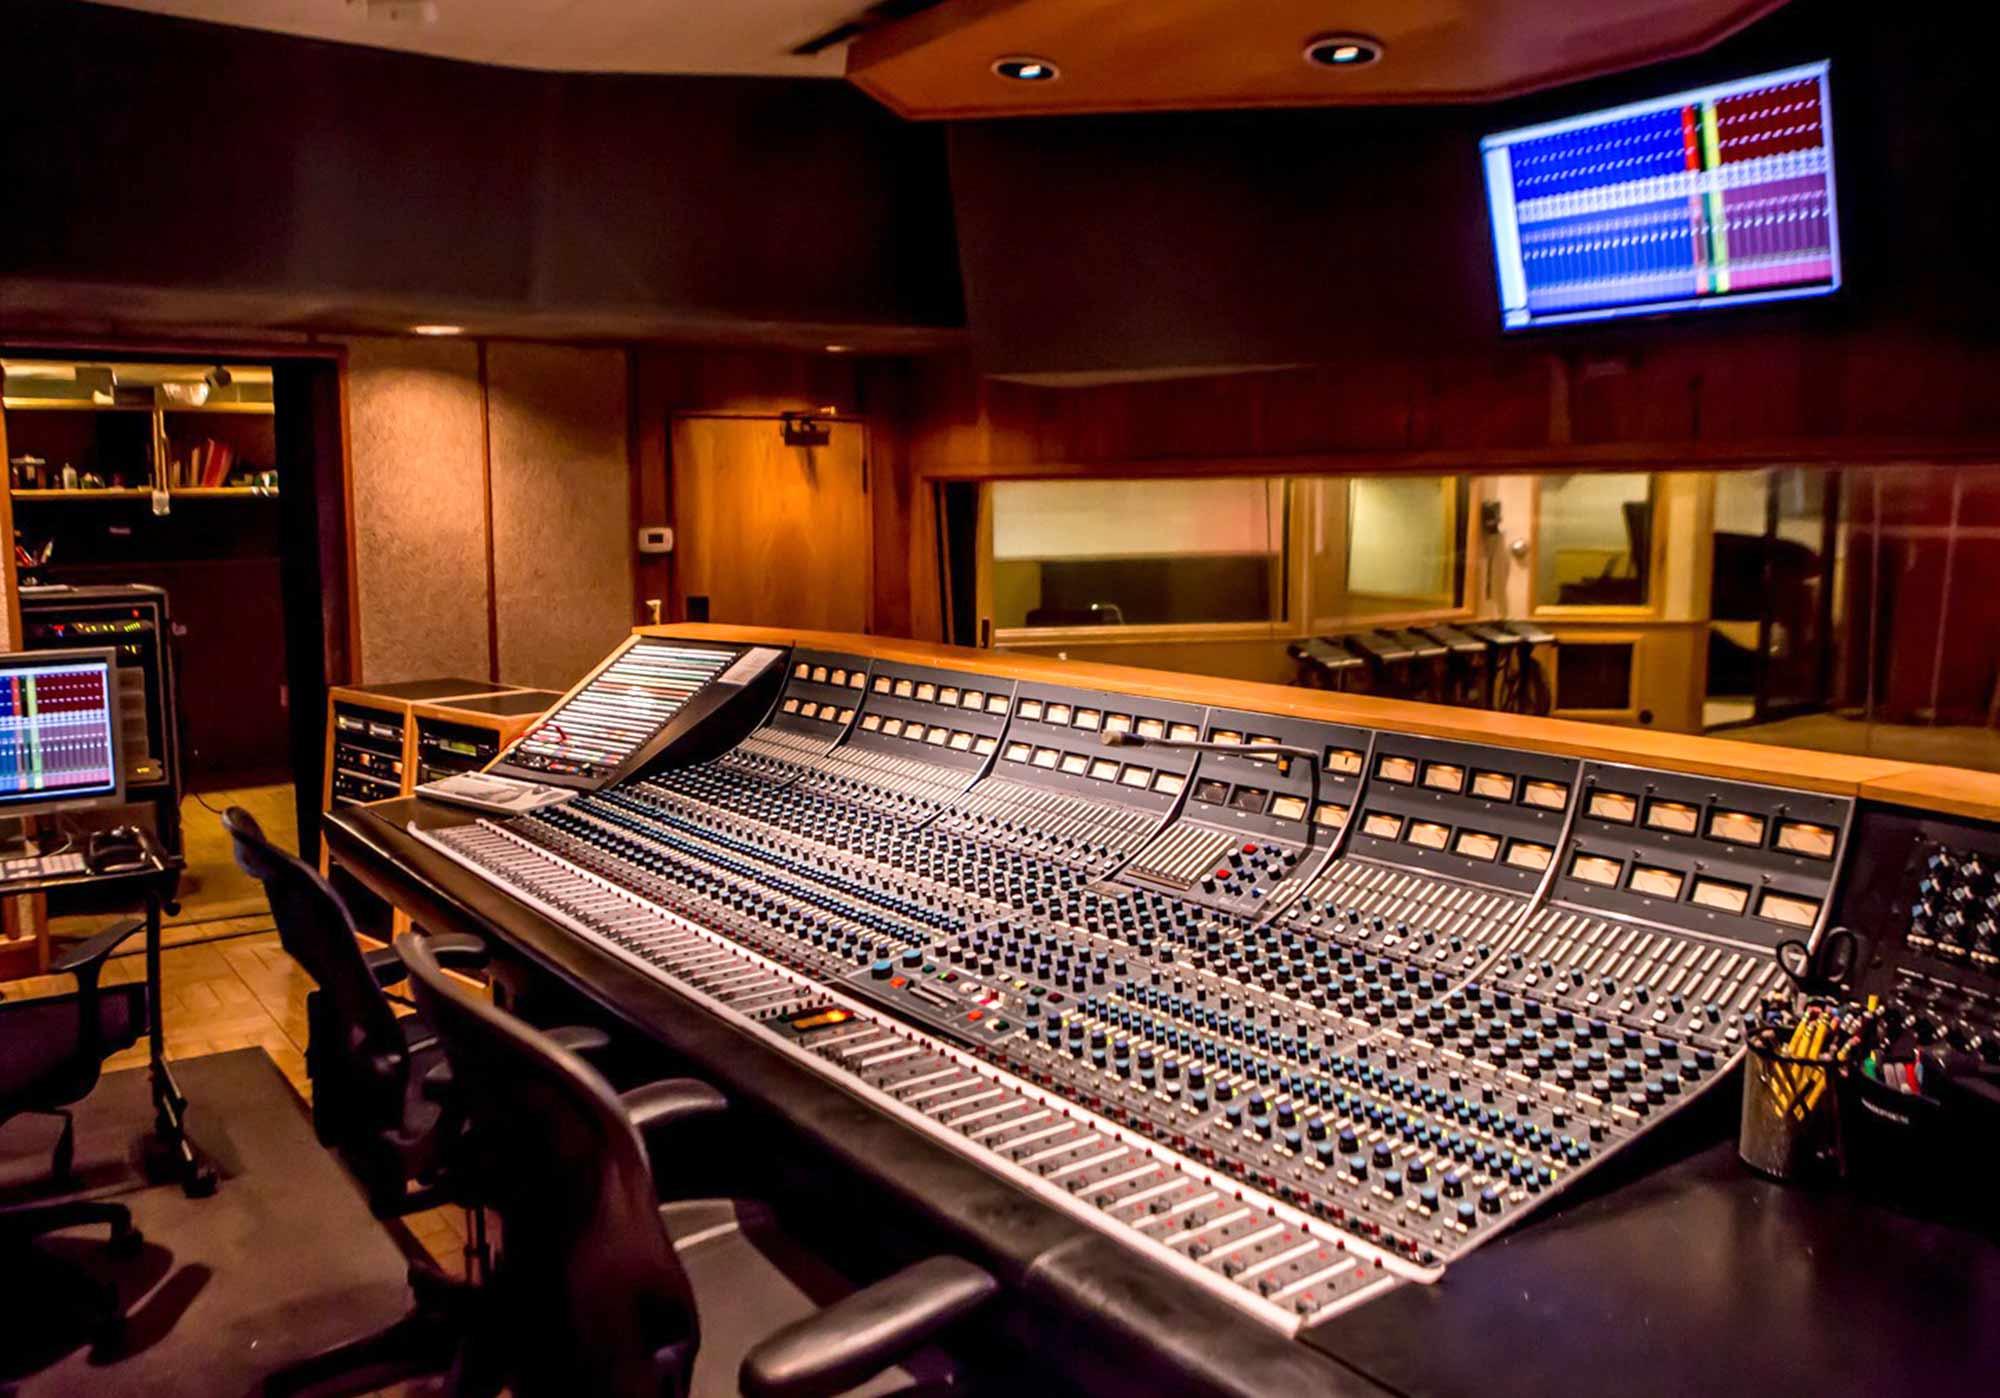 sunset_studios_control_room_2